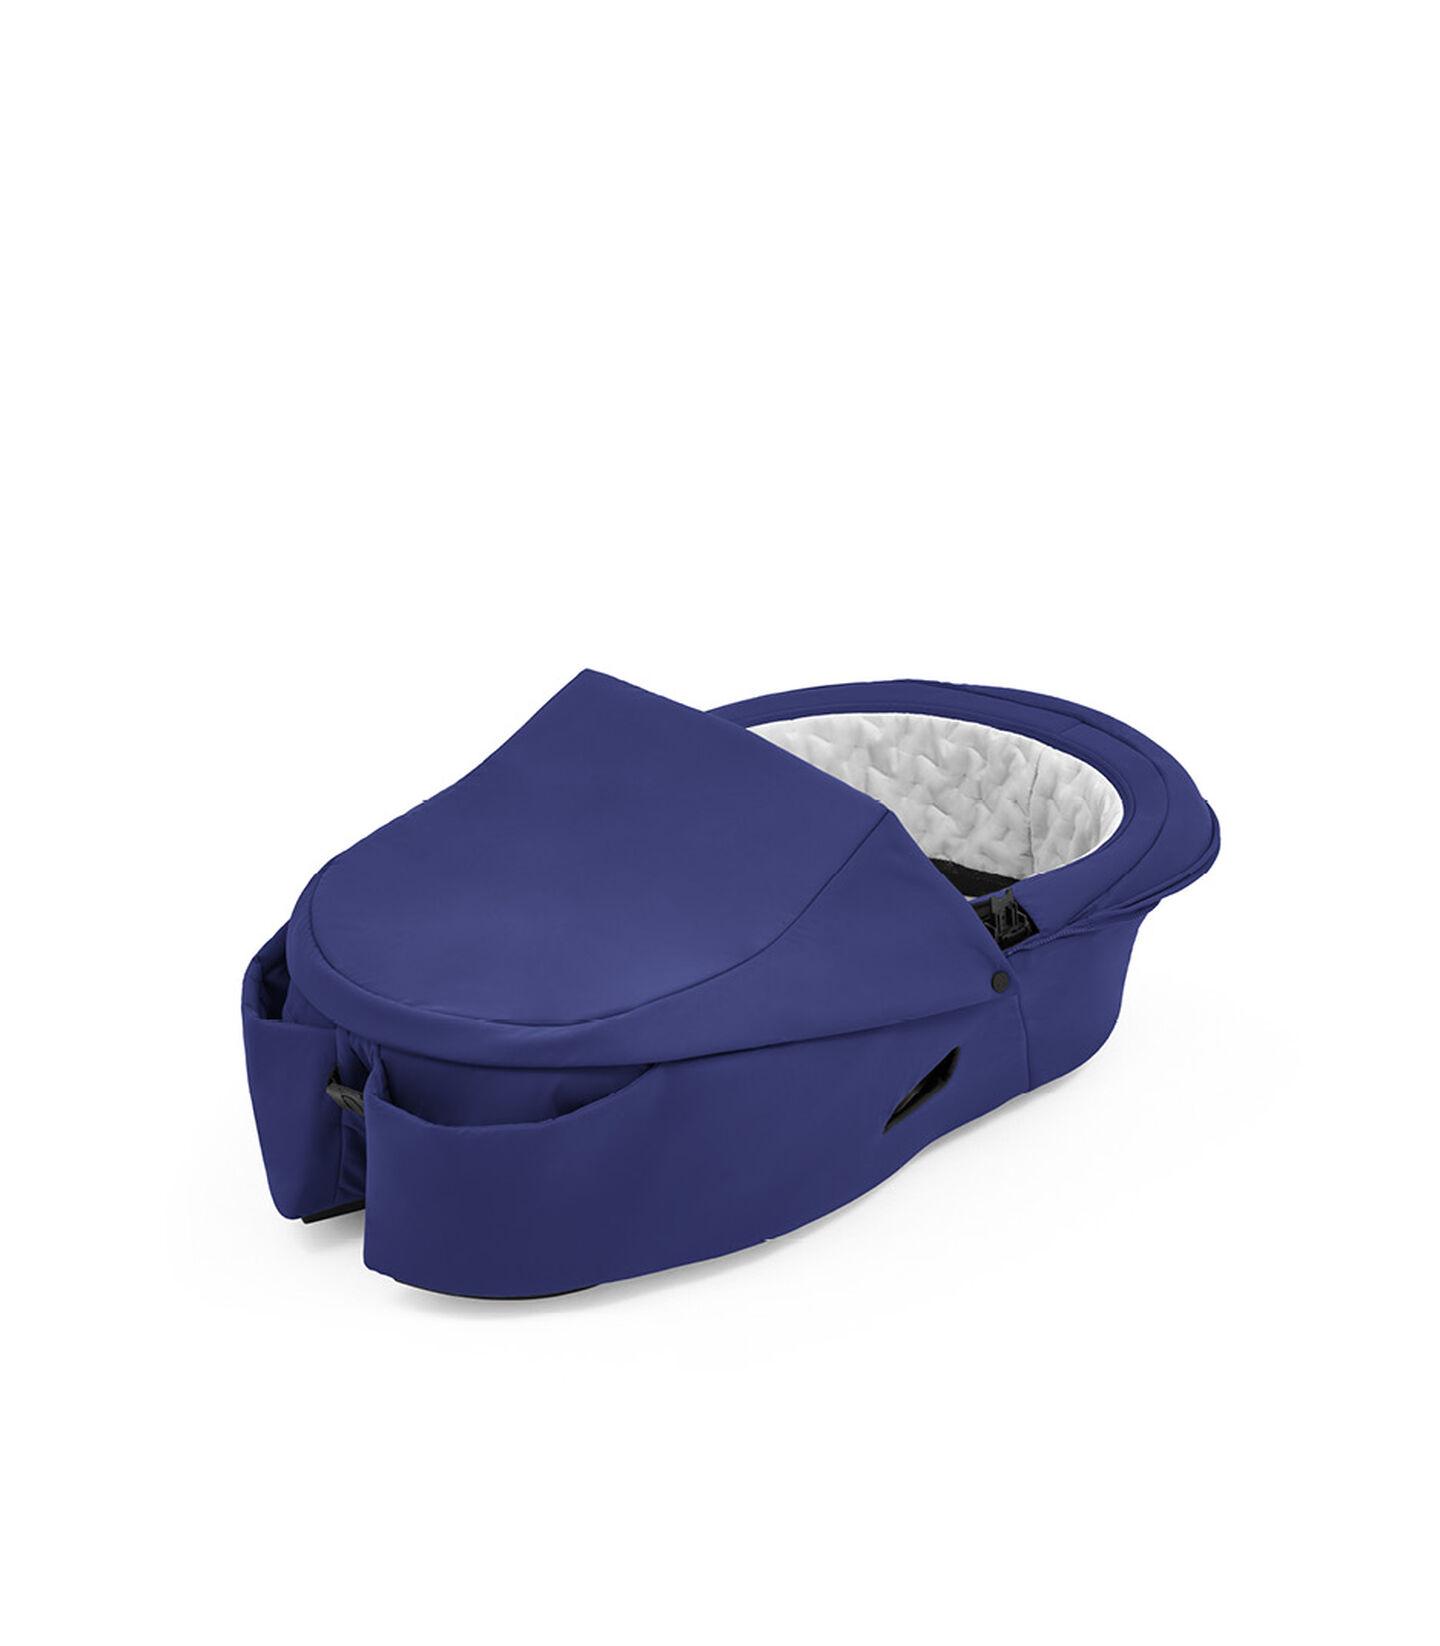 Stokke® Xplory® X Royal Blue Carry Cot, no canopy. view 1